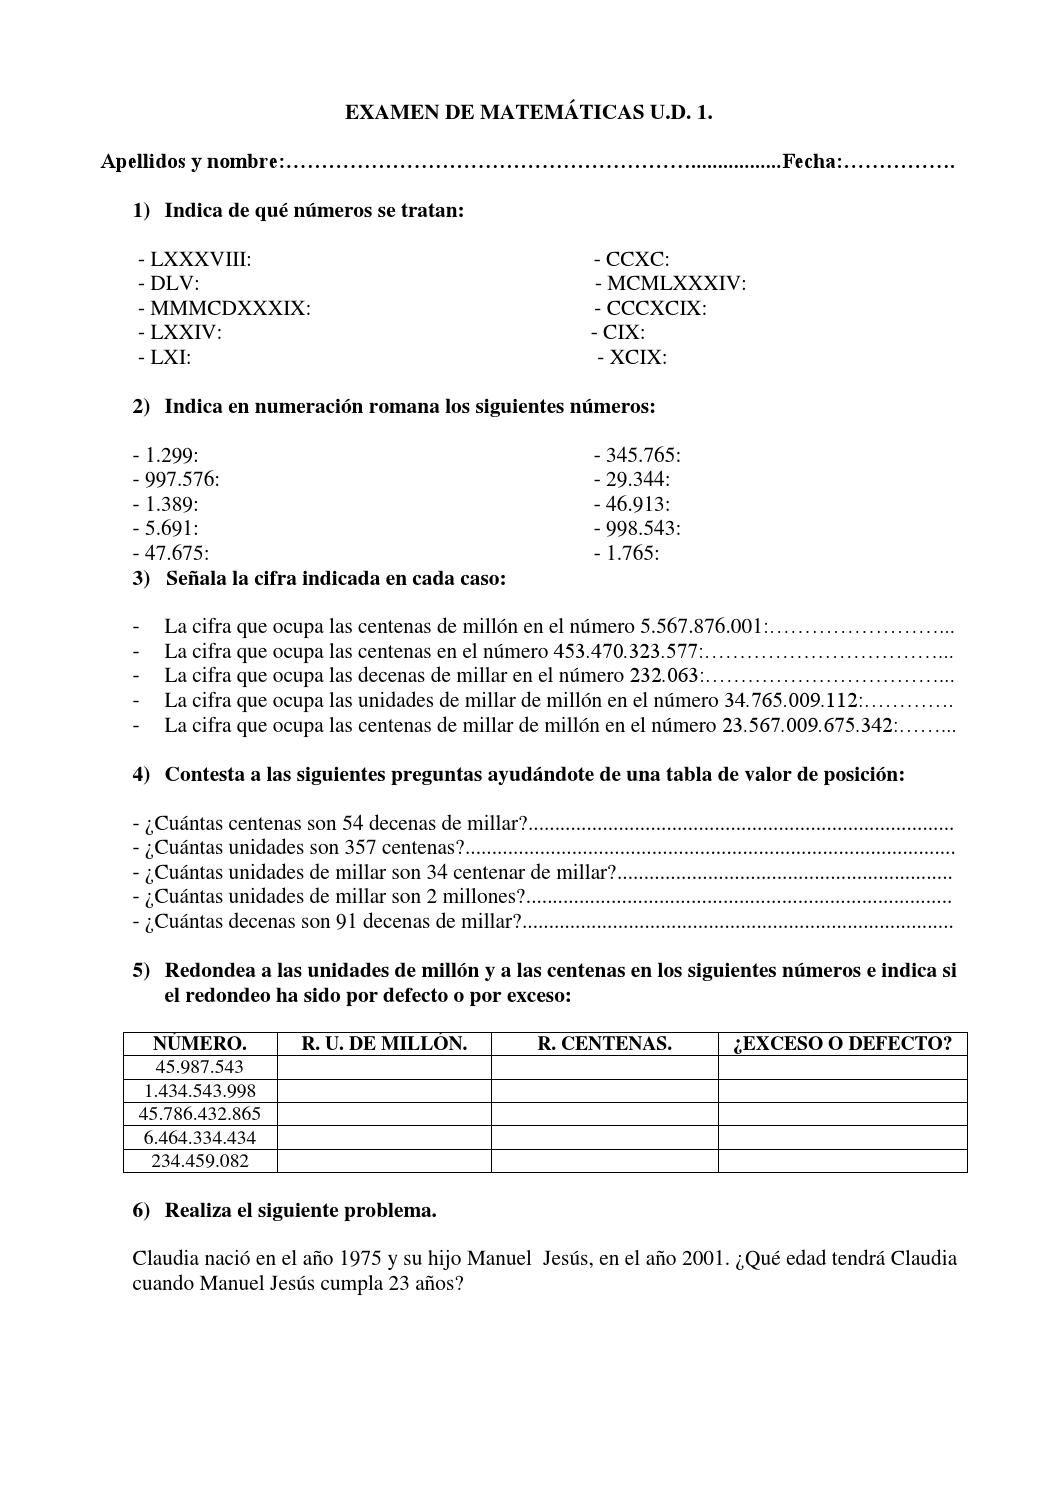 Como Se Escribe 91 En Numeros Romanos examen matemáticas 1º eso tema 1 | exámen de matemáticas